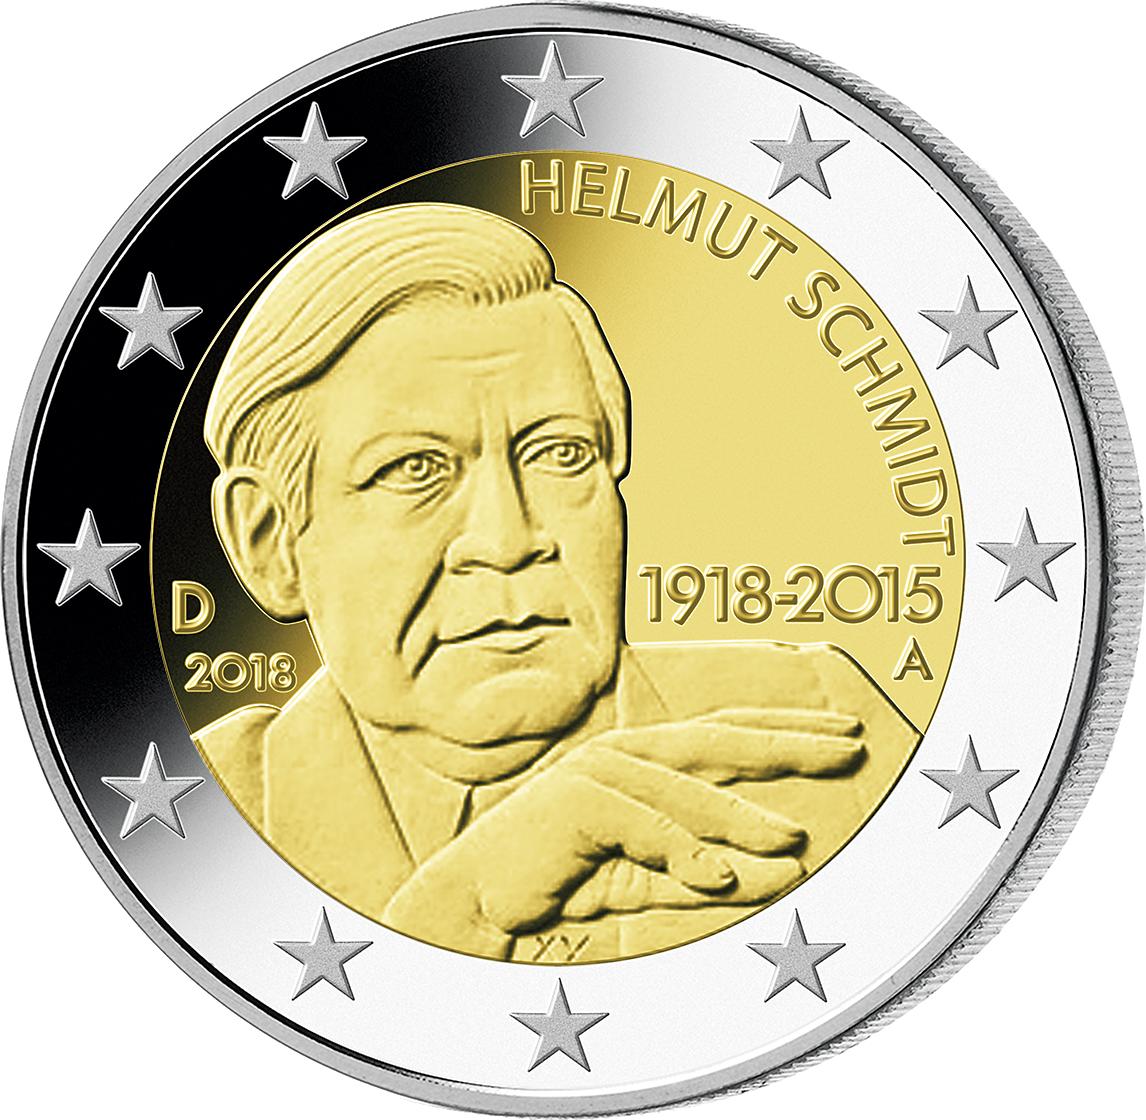 5 X 2 Euro Münzen Helmut Schmidt Komplettsatz 2018 Pp Münzen